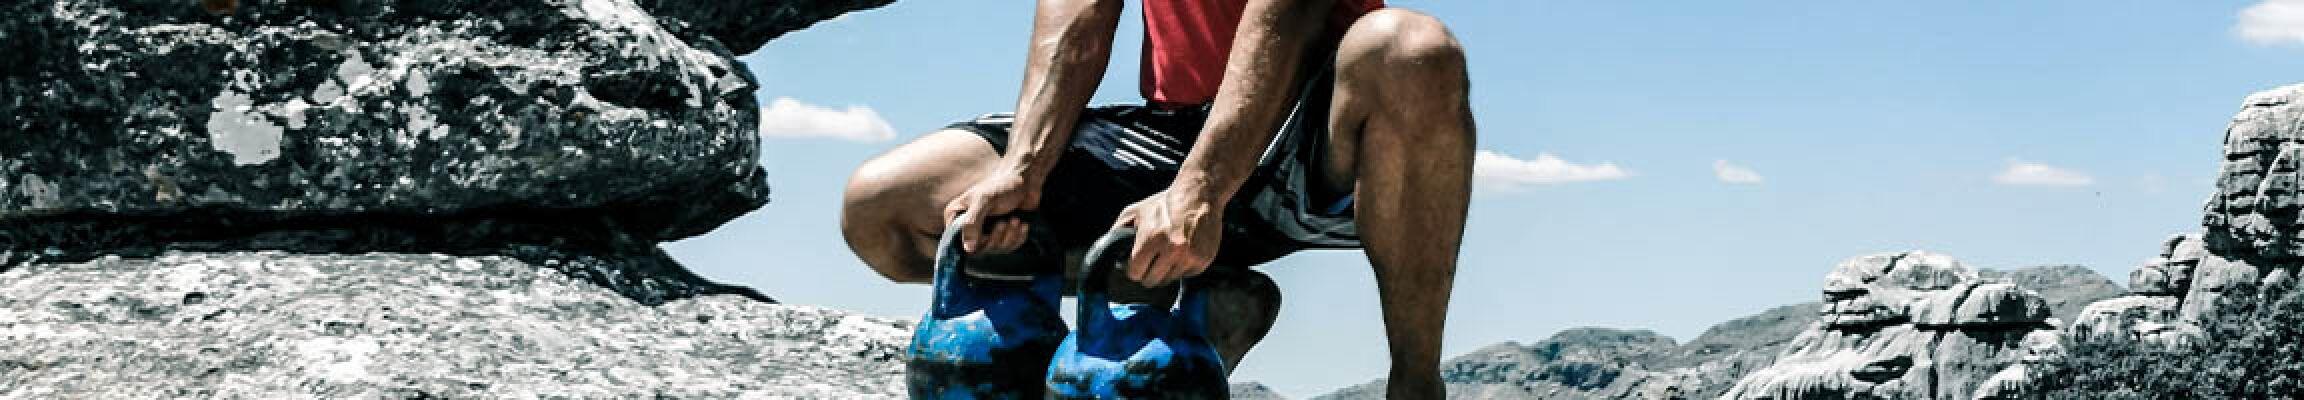 Fazit Optimaler Muskelaufbau:Morgens oder Abends trainieren?